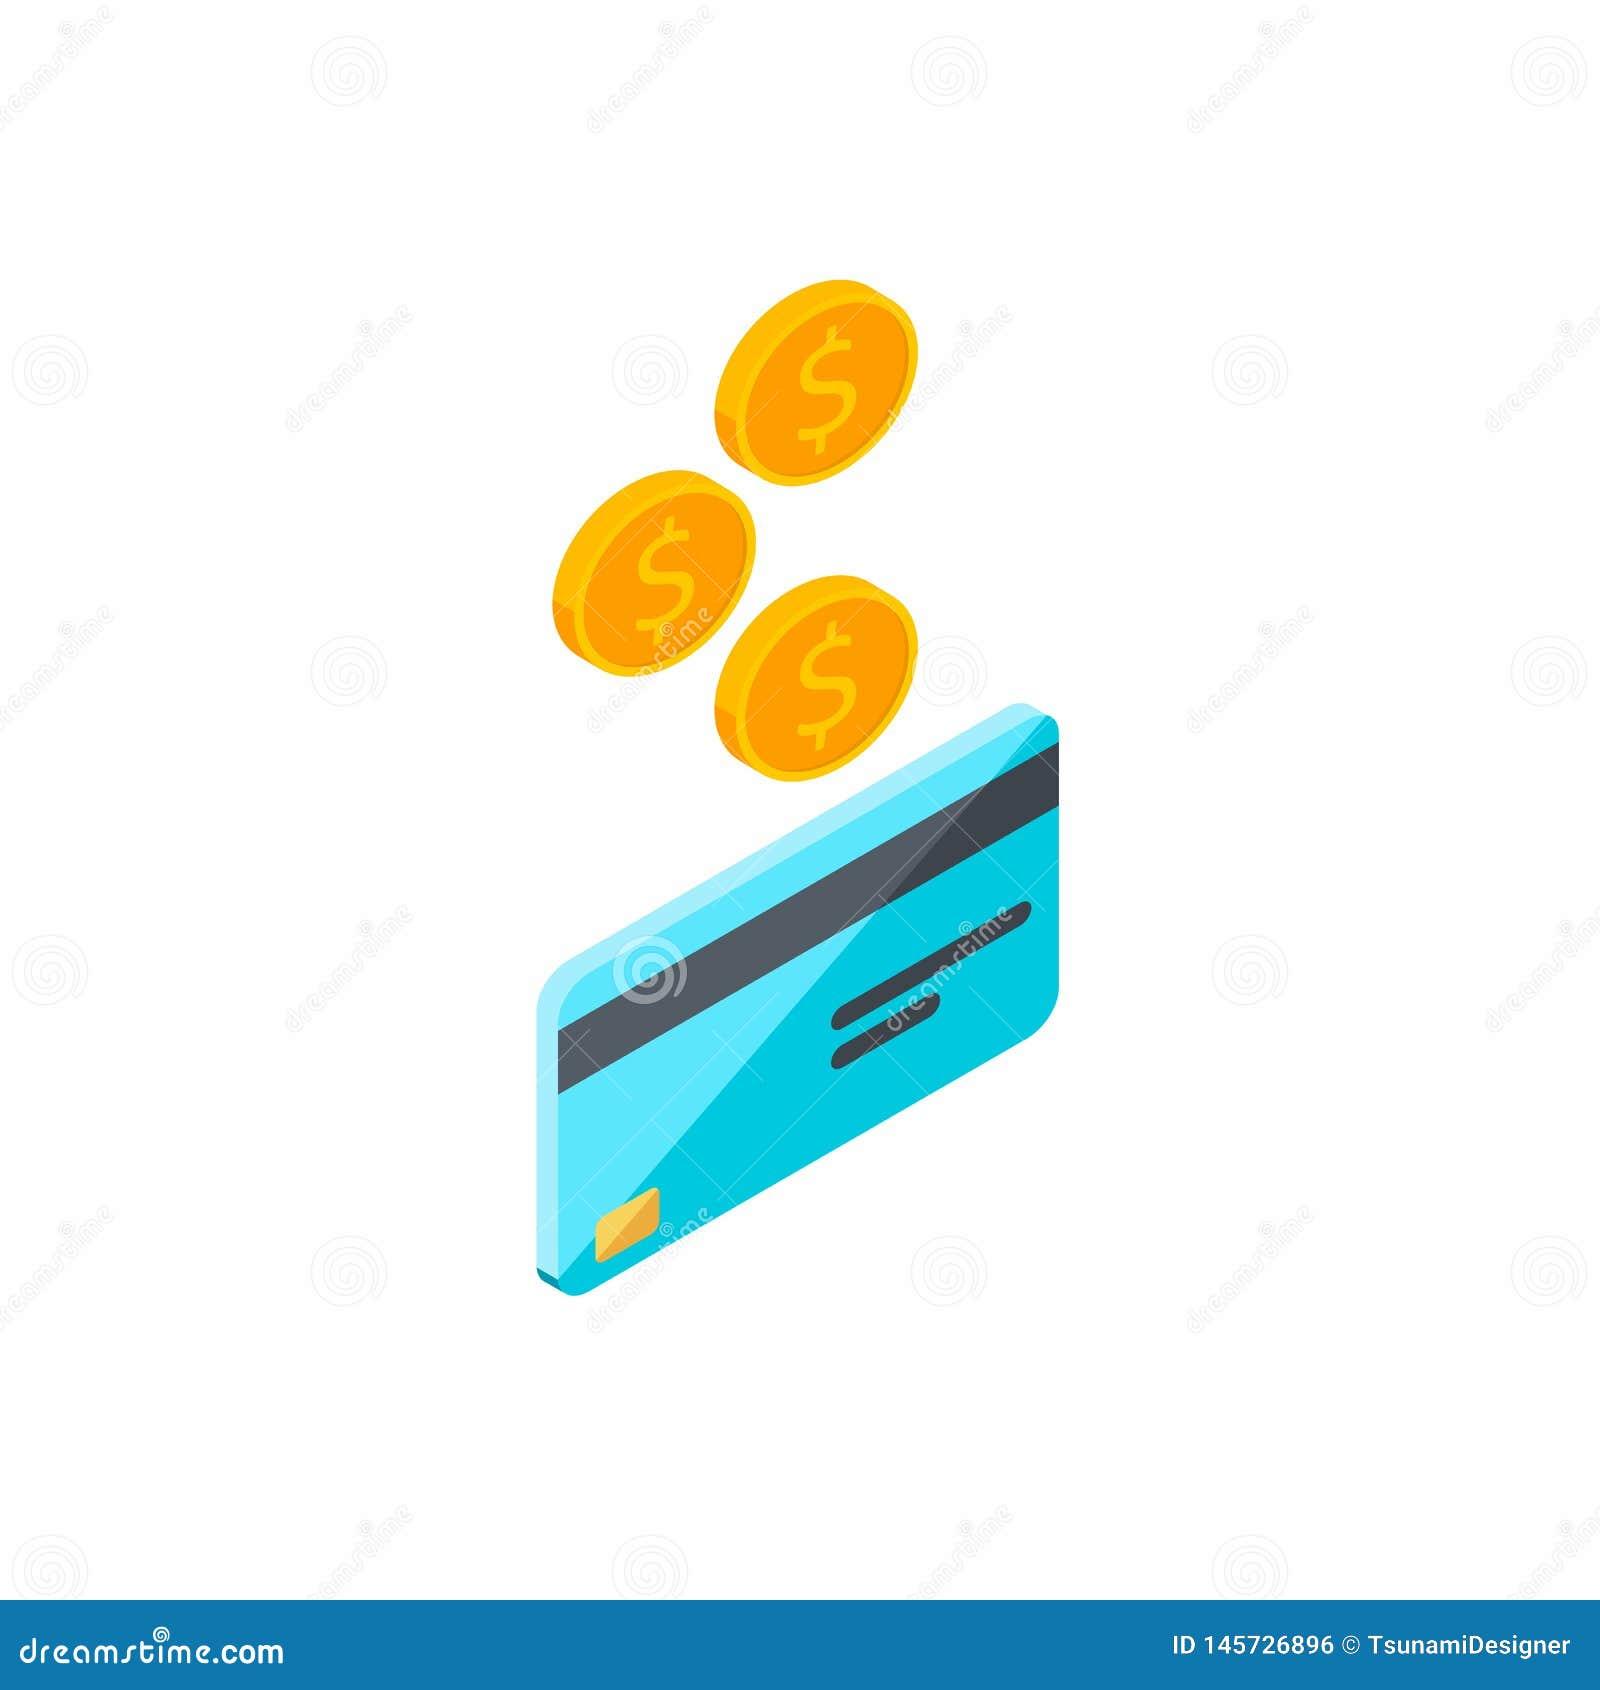 Karta kredytowa, Zarabia pieni?dze, Isometric, moneta, finanse, bank karta, biznes, wektor, got?wka dostaje bank kart?